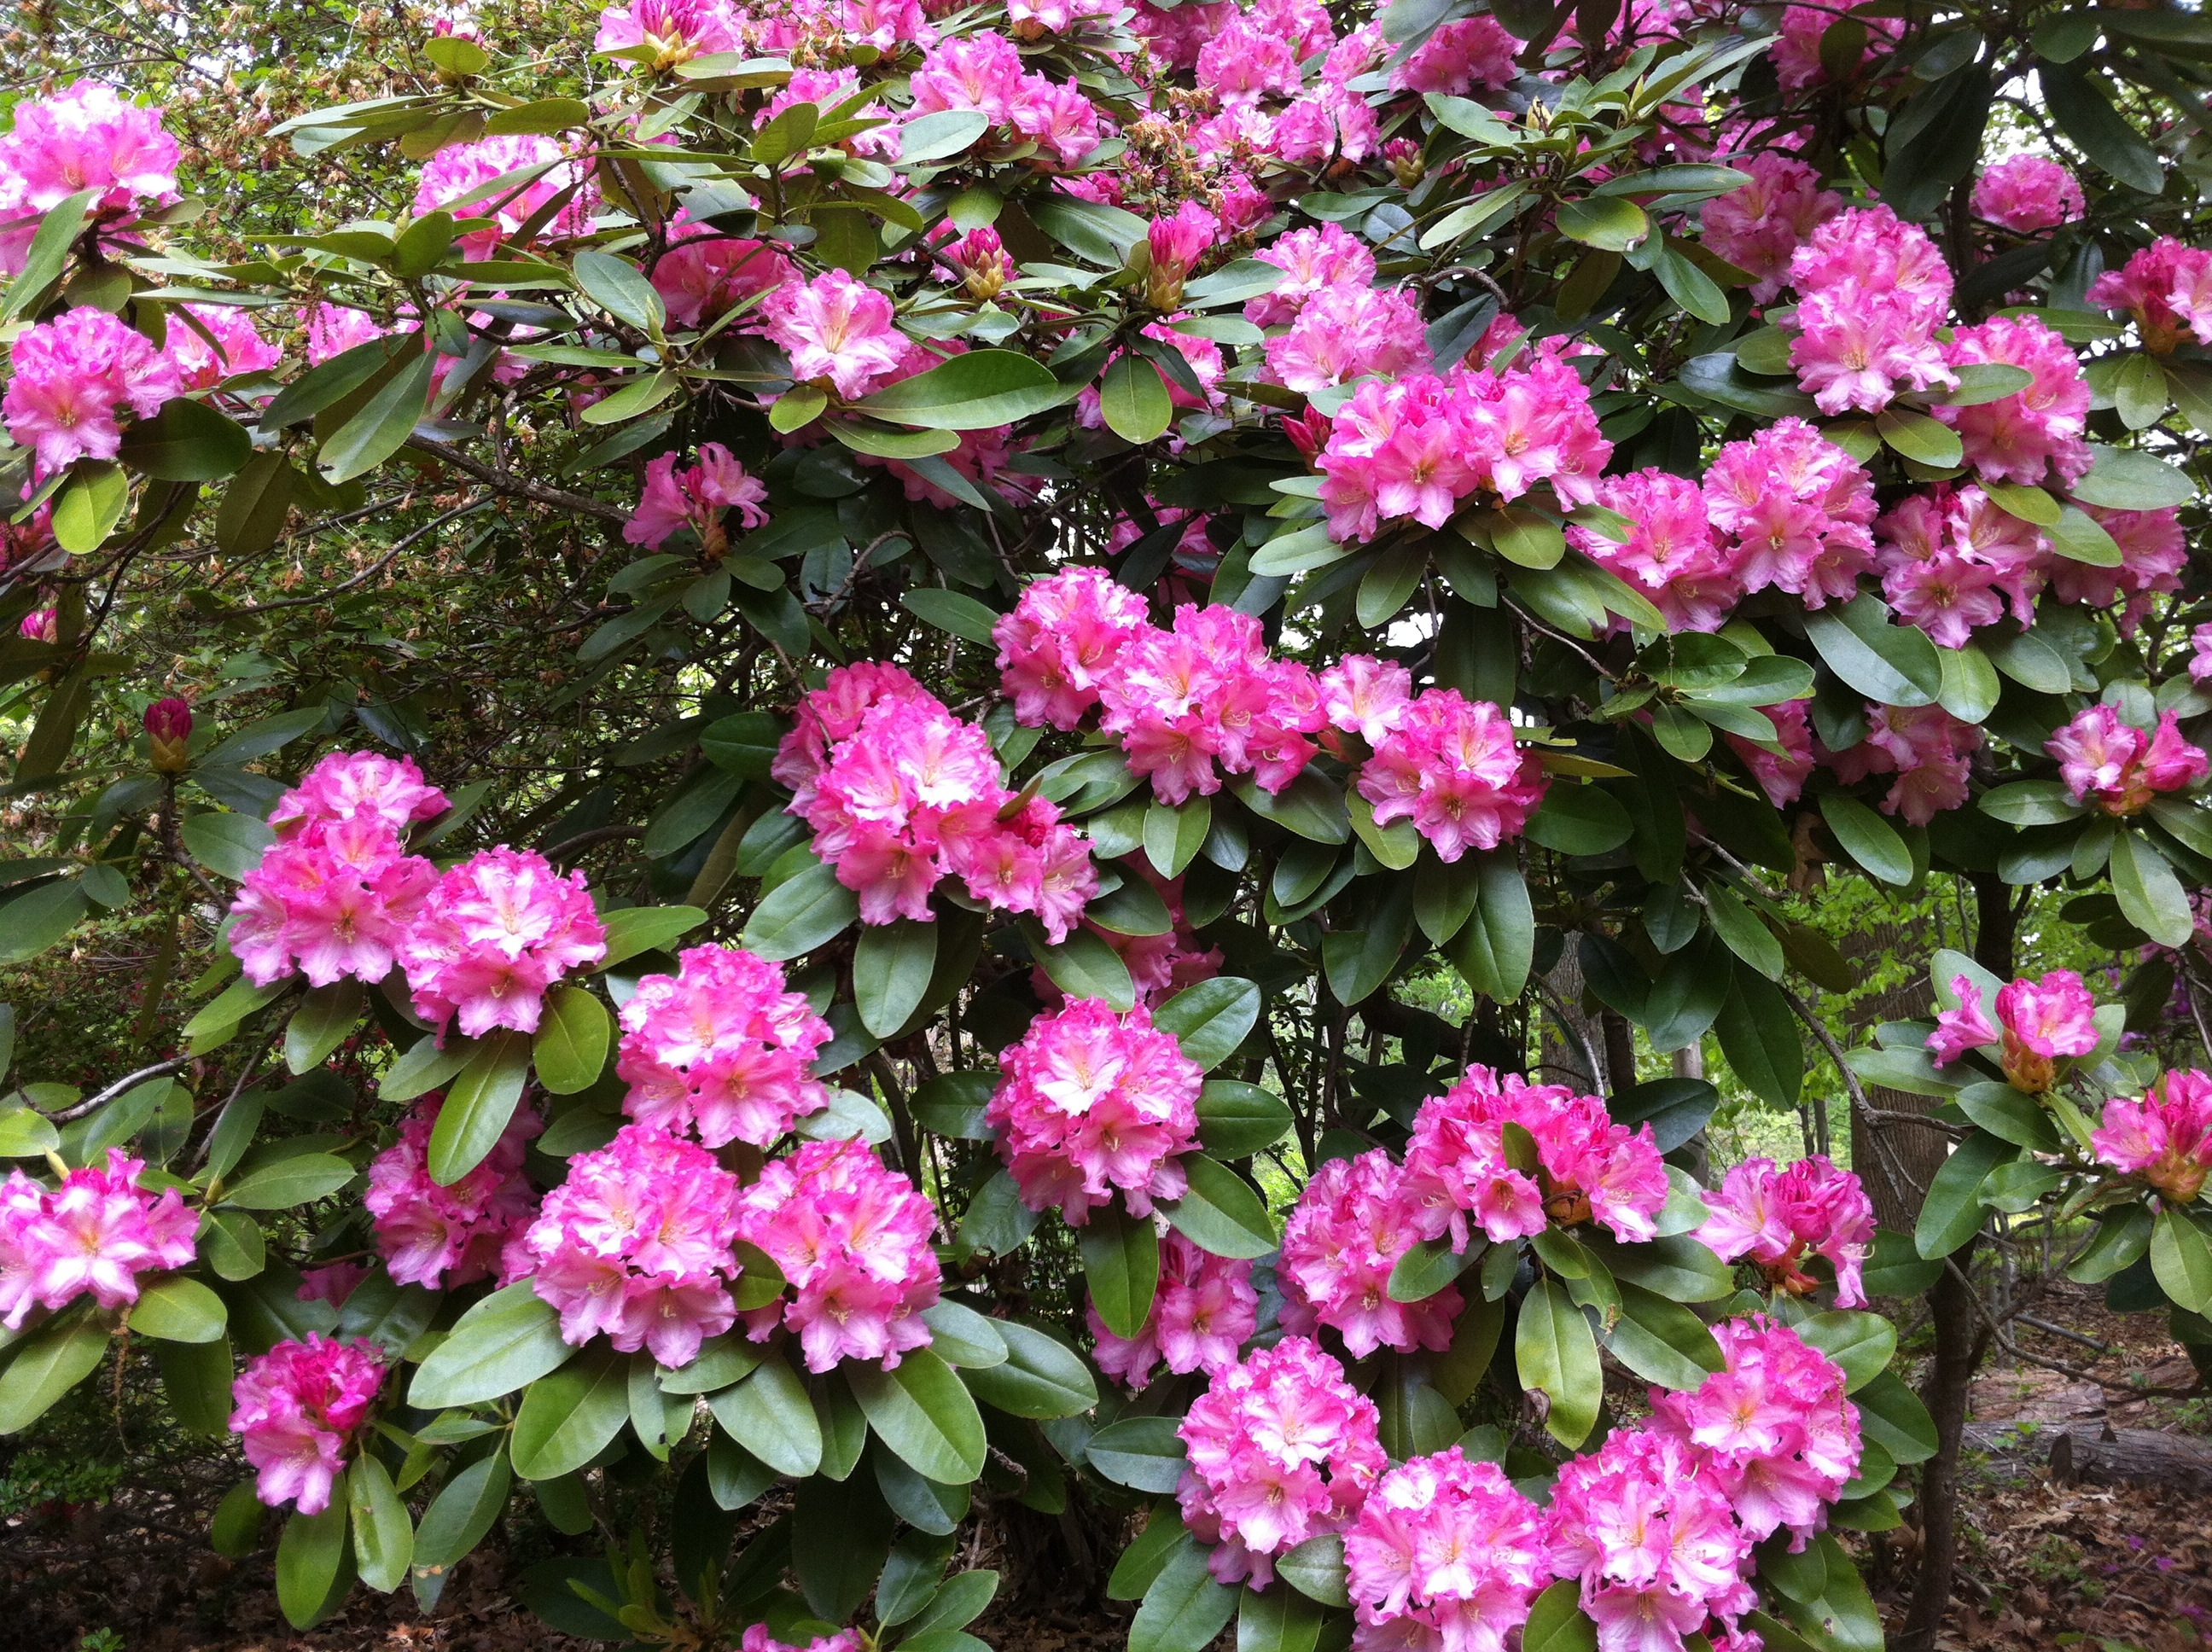 RhododenronMagenta